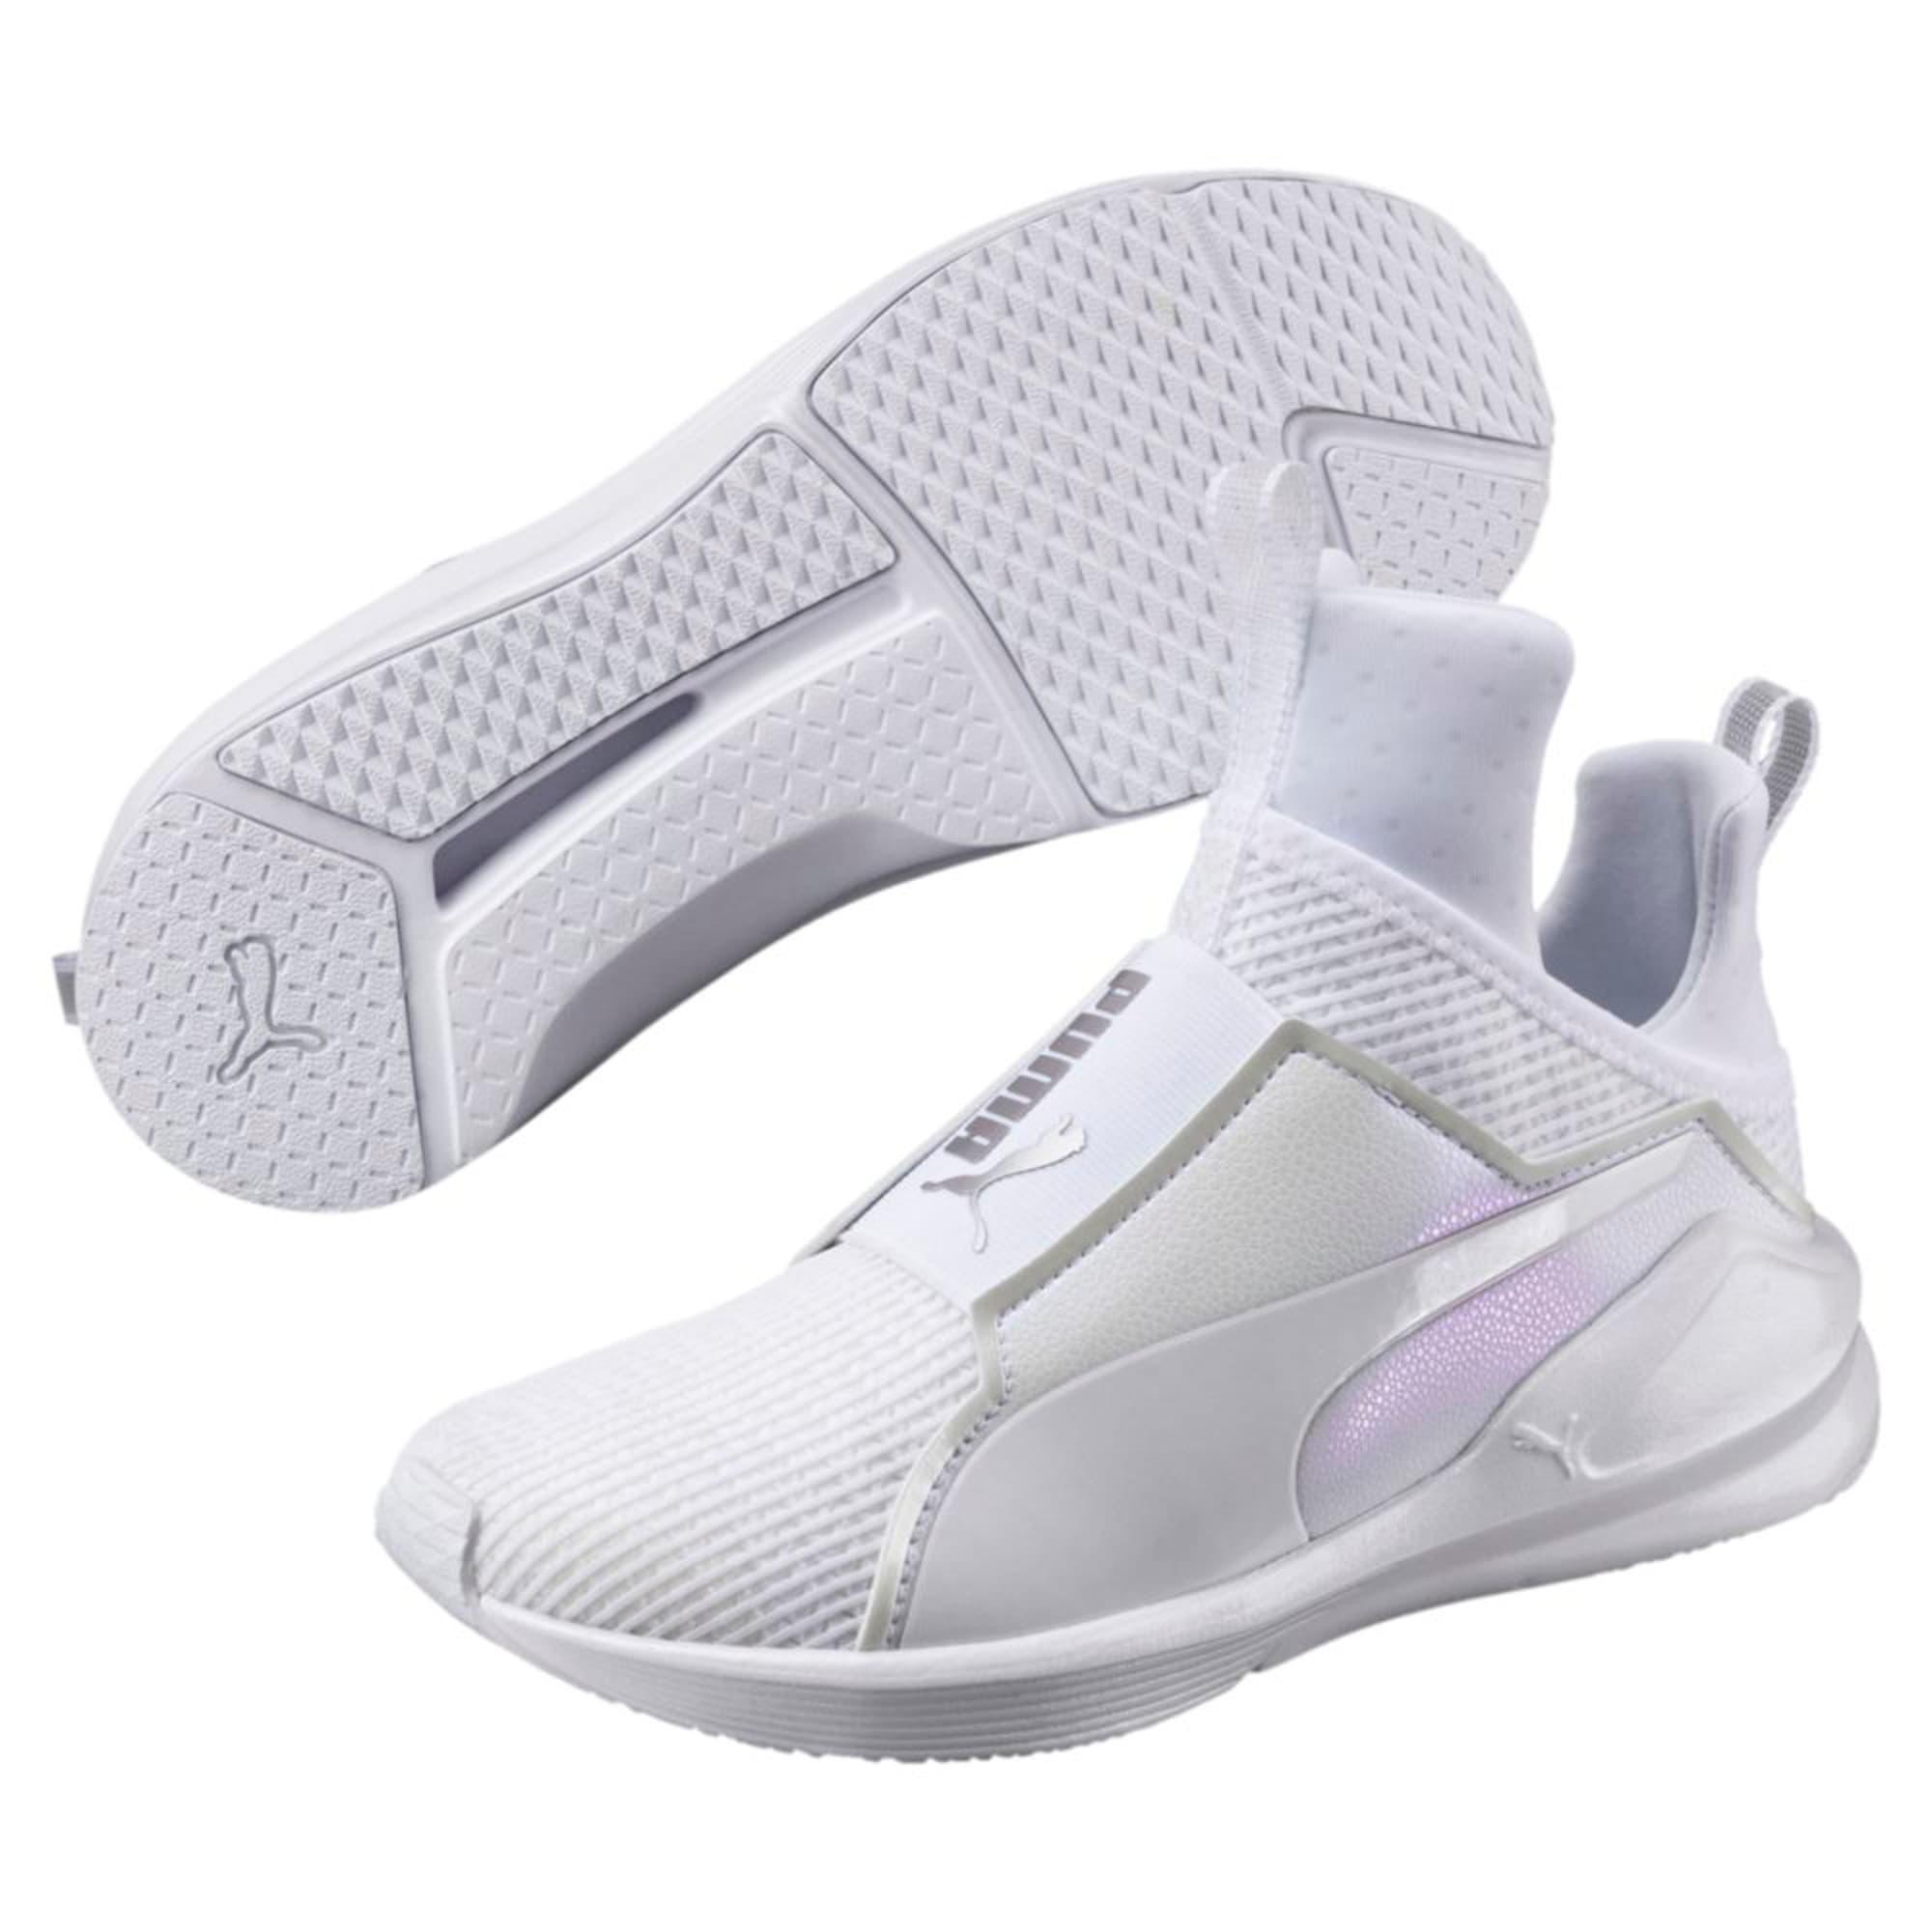 Thumbnail 6 of Fierce En Pointe Women's Training Shoes, Puma White-Puma White, medium-IND